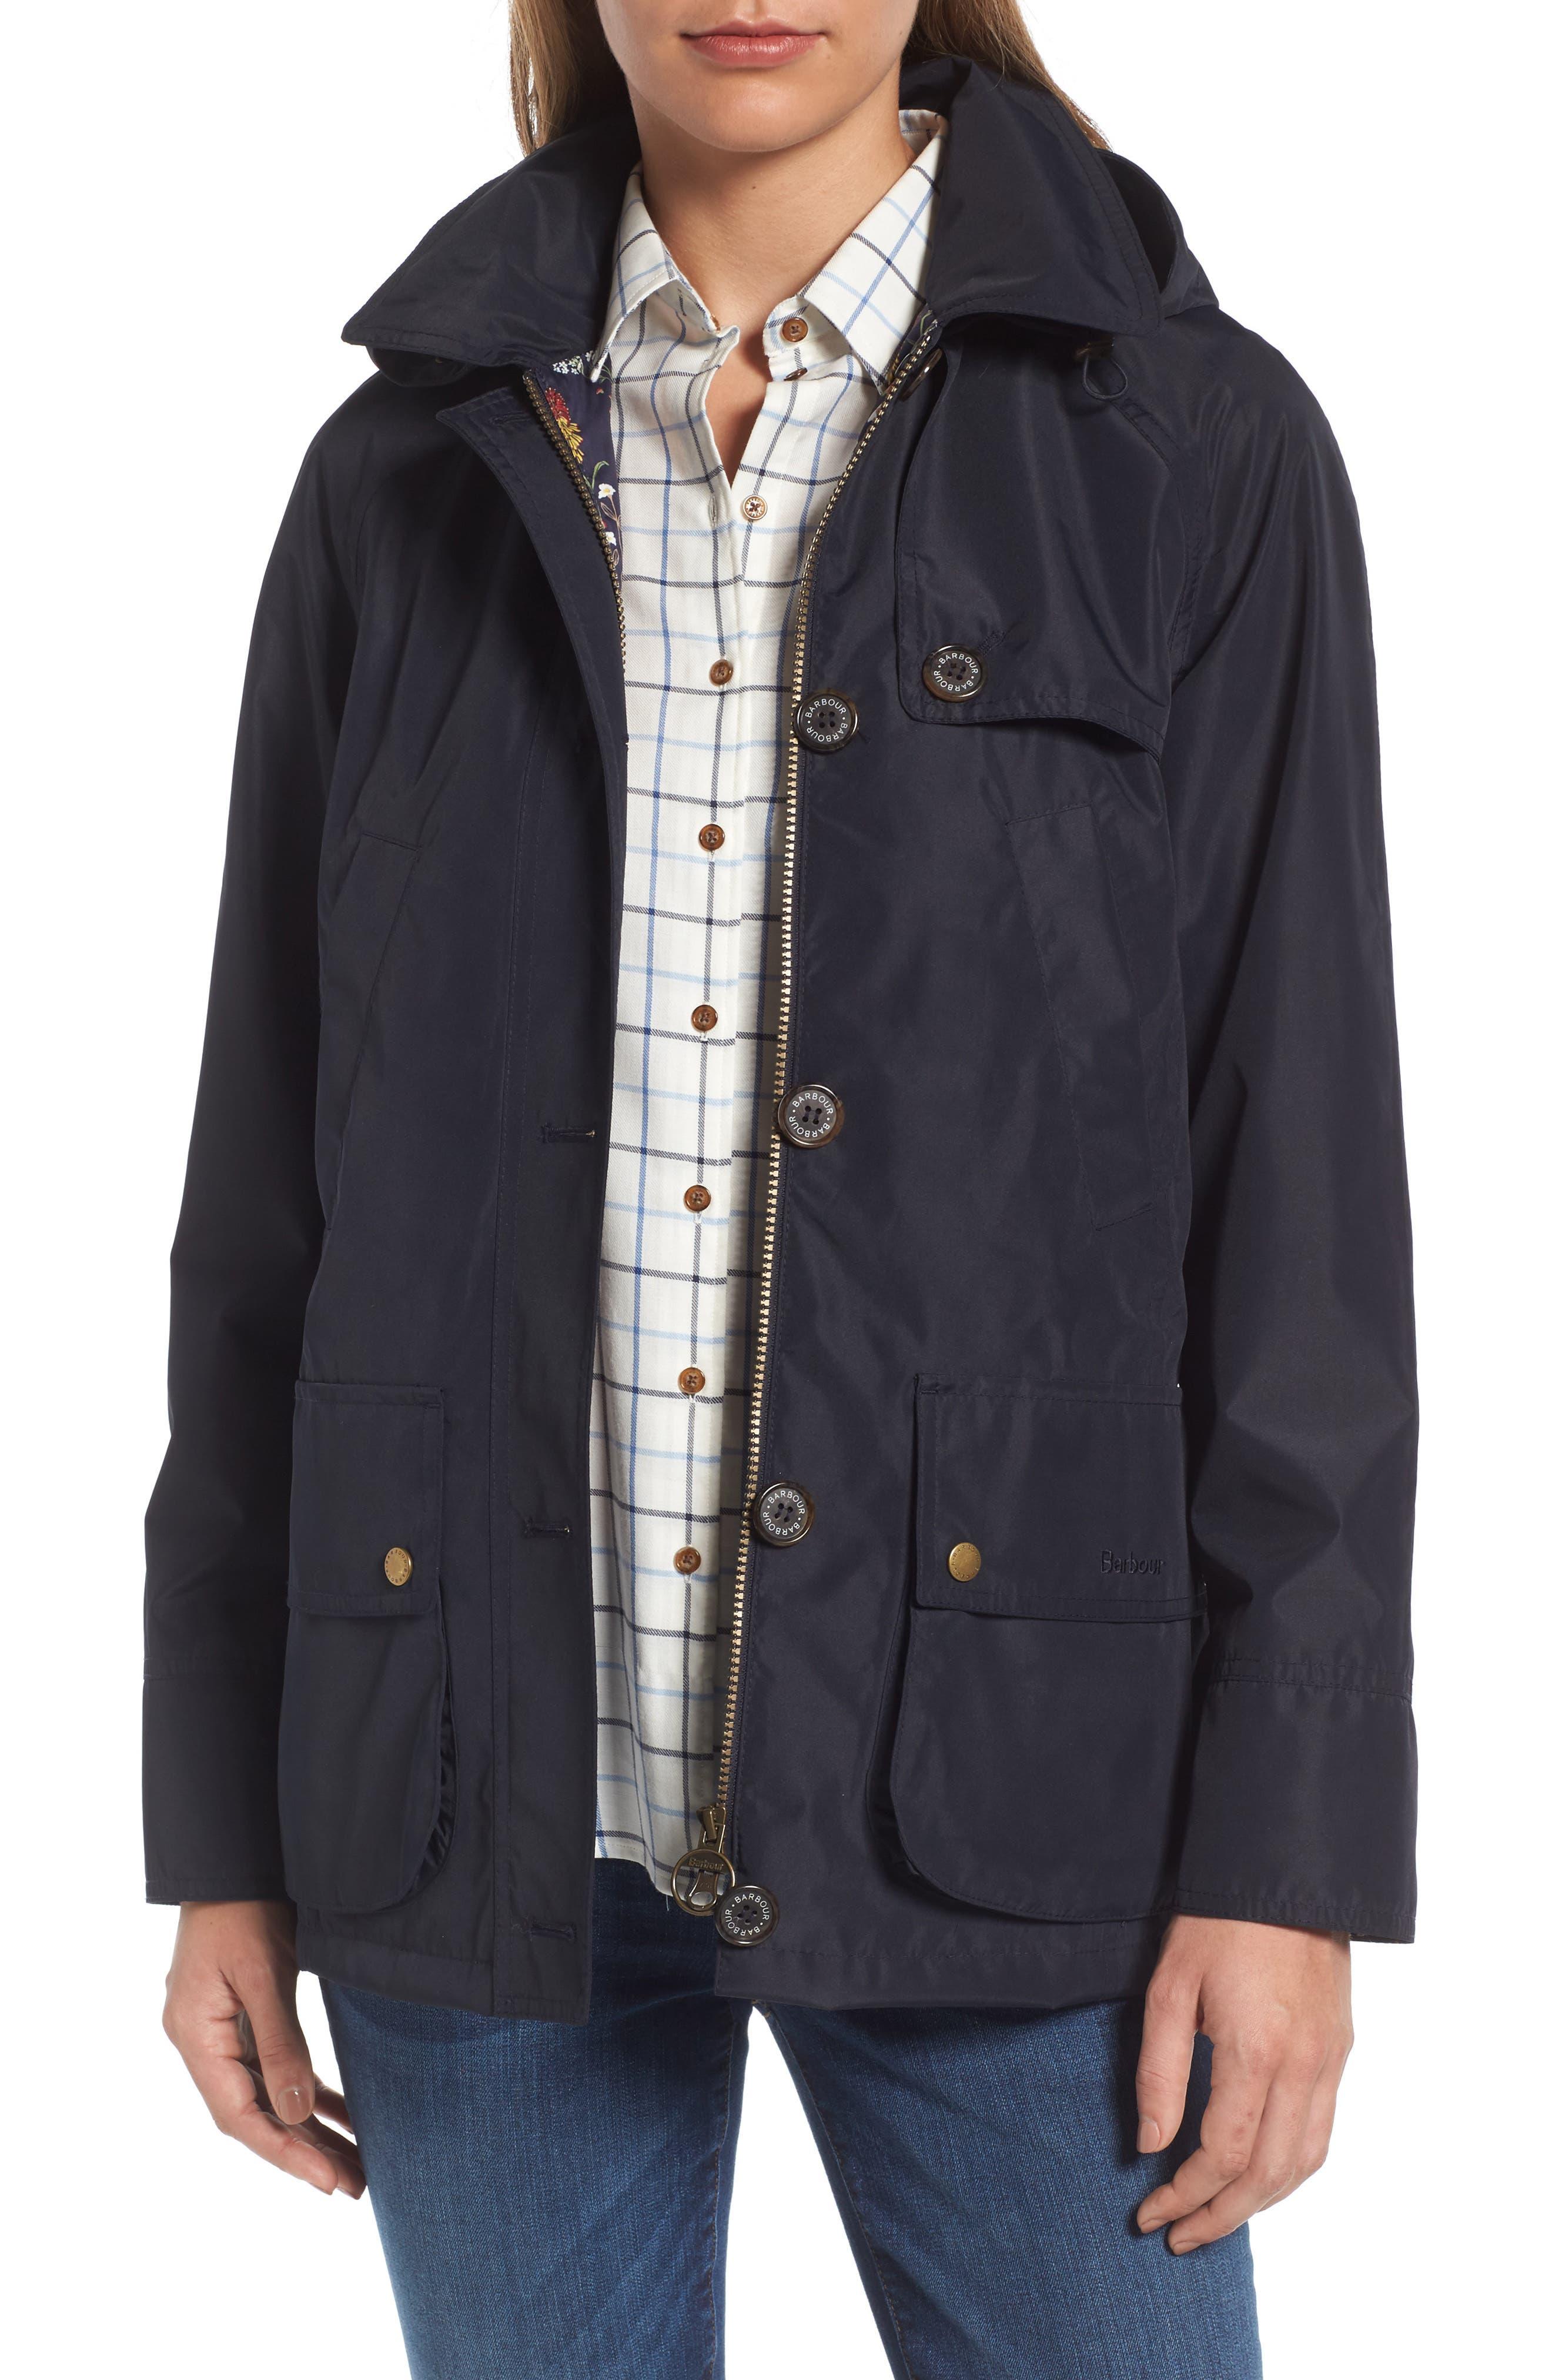 Barbour 'Wytherstone' Waterproof Rain Jacket